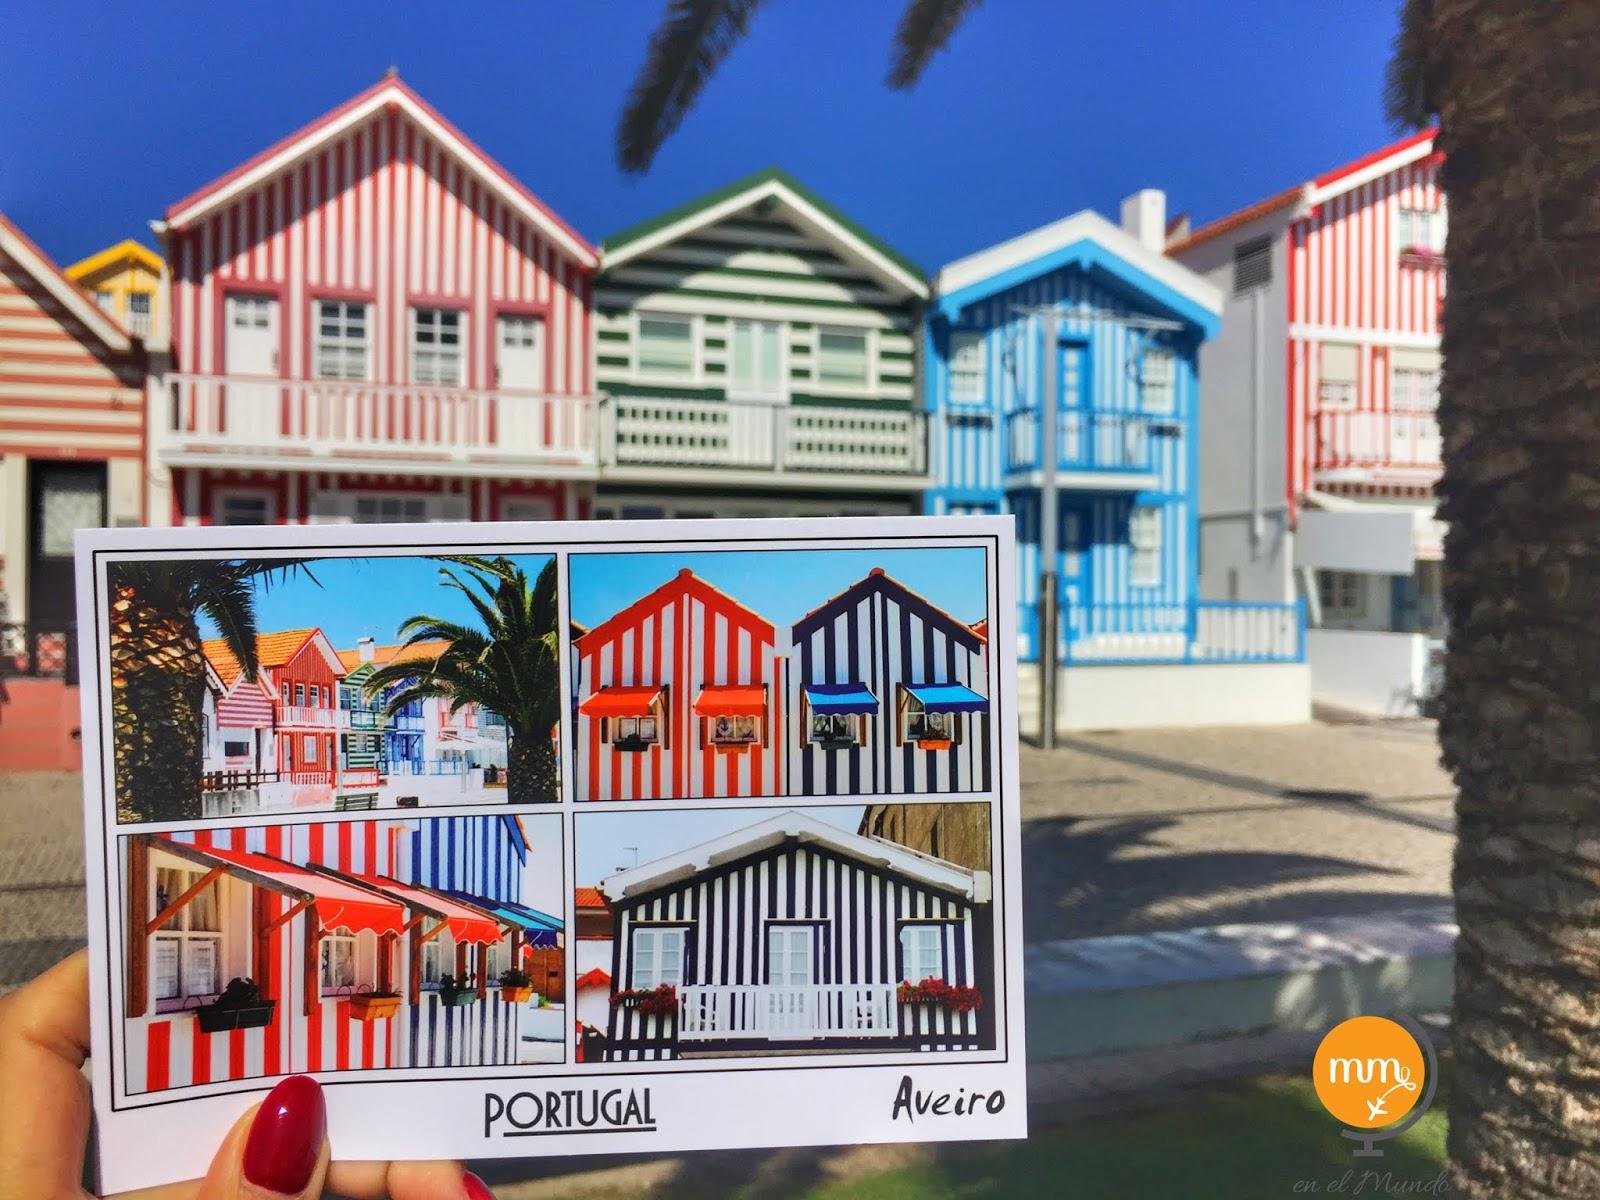 Costa Nova - pasiasta Portugalia w pobliżu Porto!